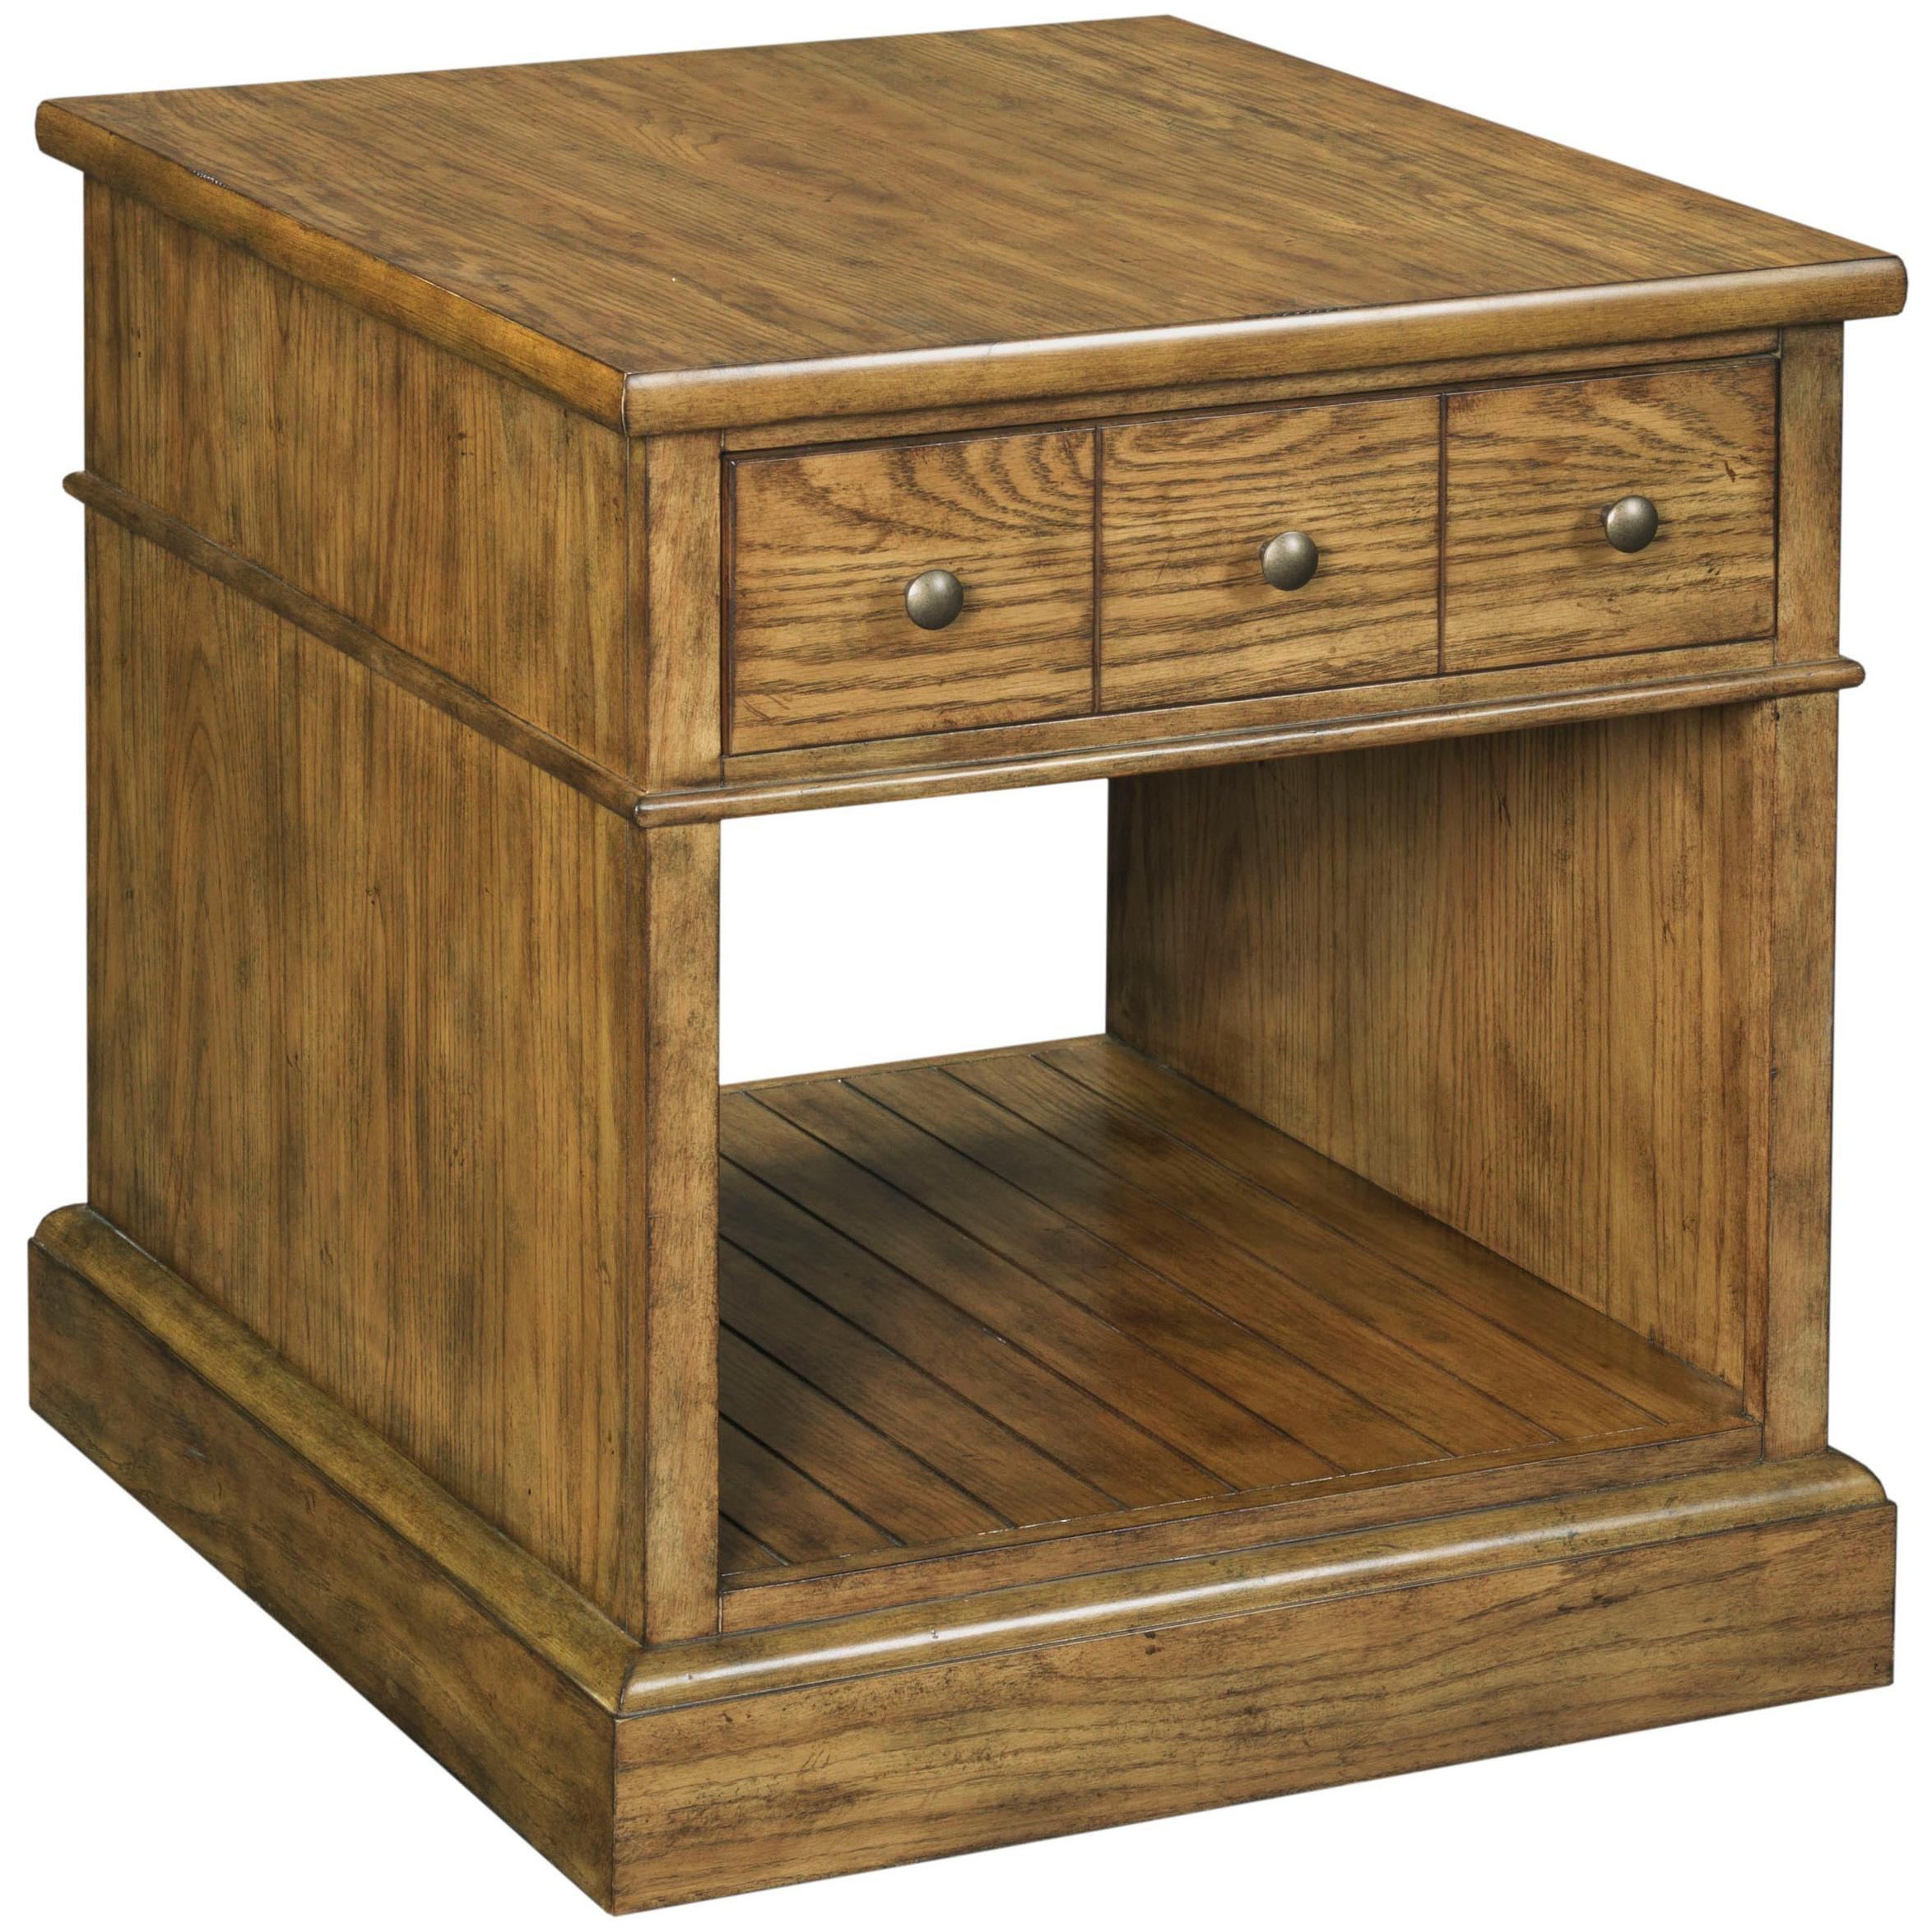 Broyhill Furniture New Vintage Drawer End Table - Item Number: 4808-012